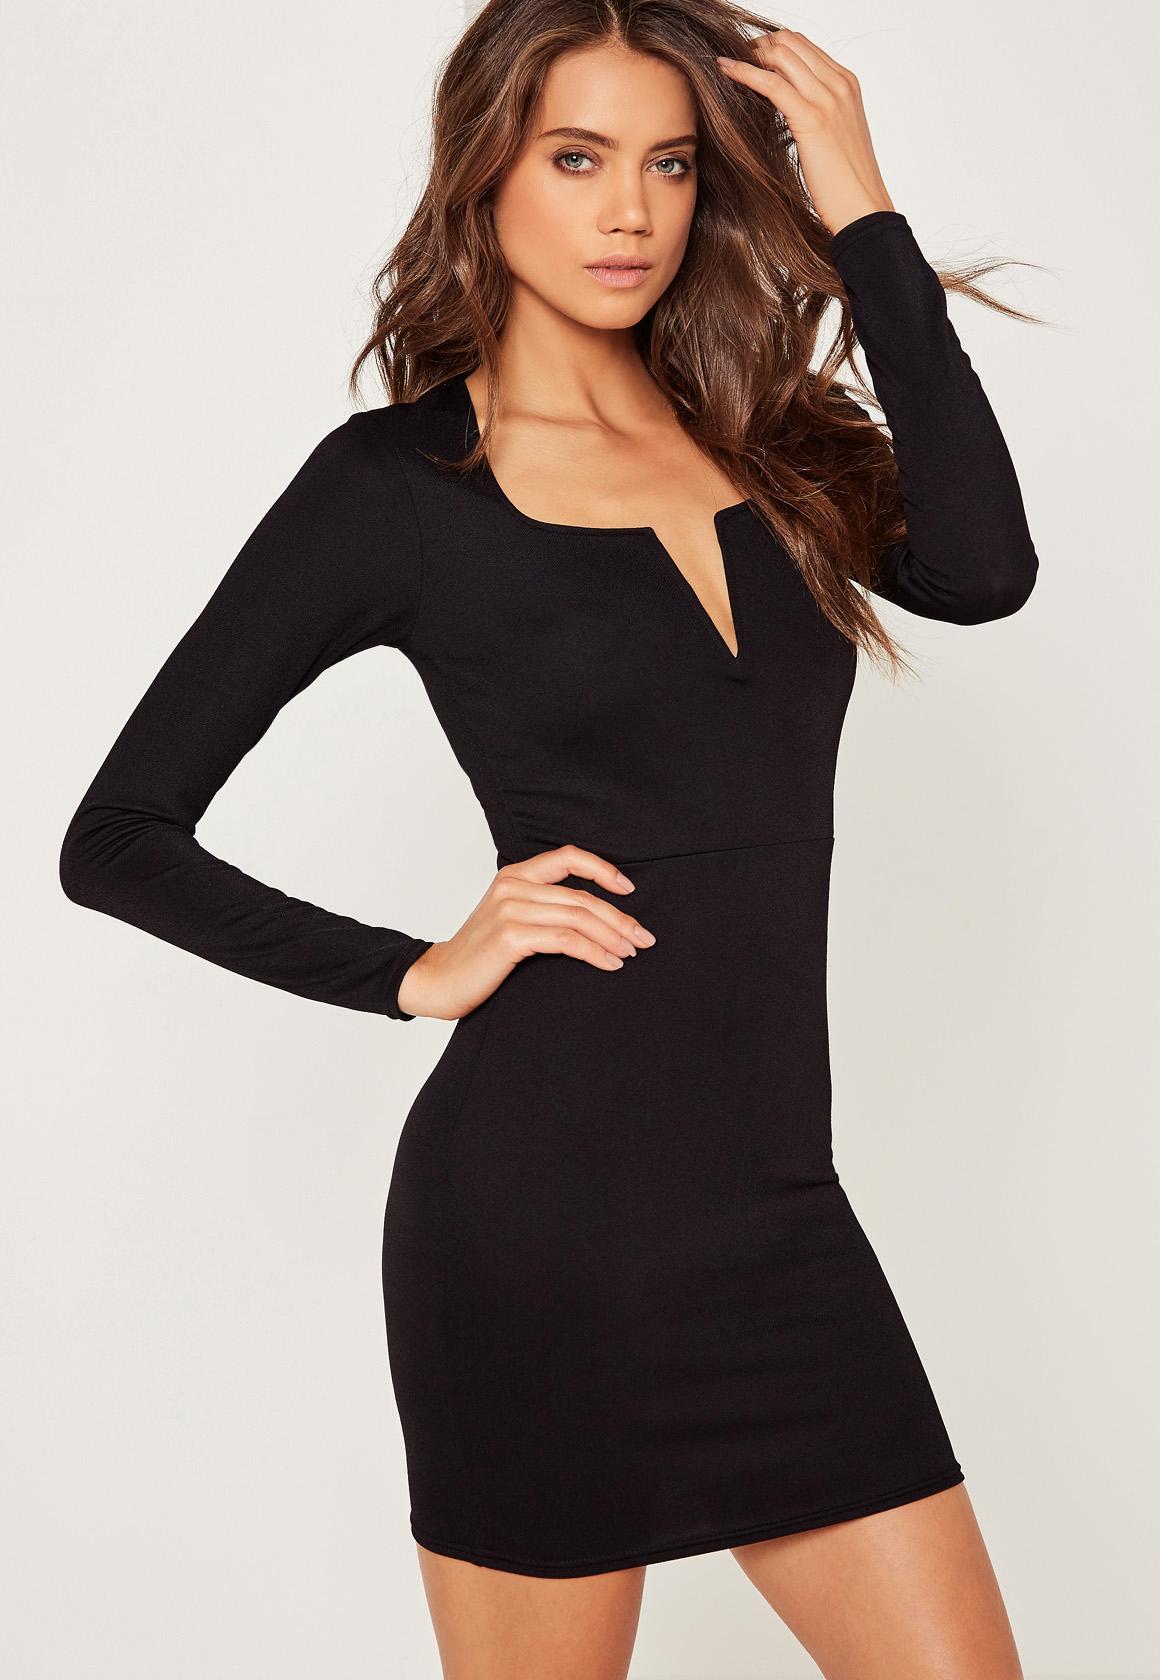 48772ca4cd88 Robe noir moulante courte manches longue - Fashion Club Wear